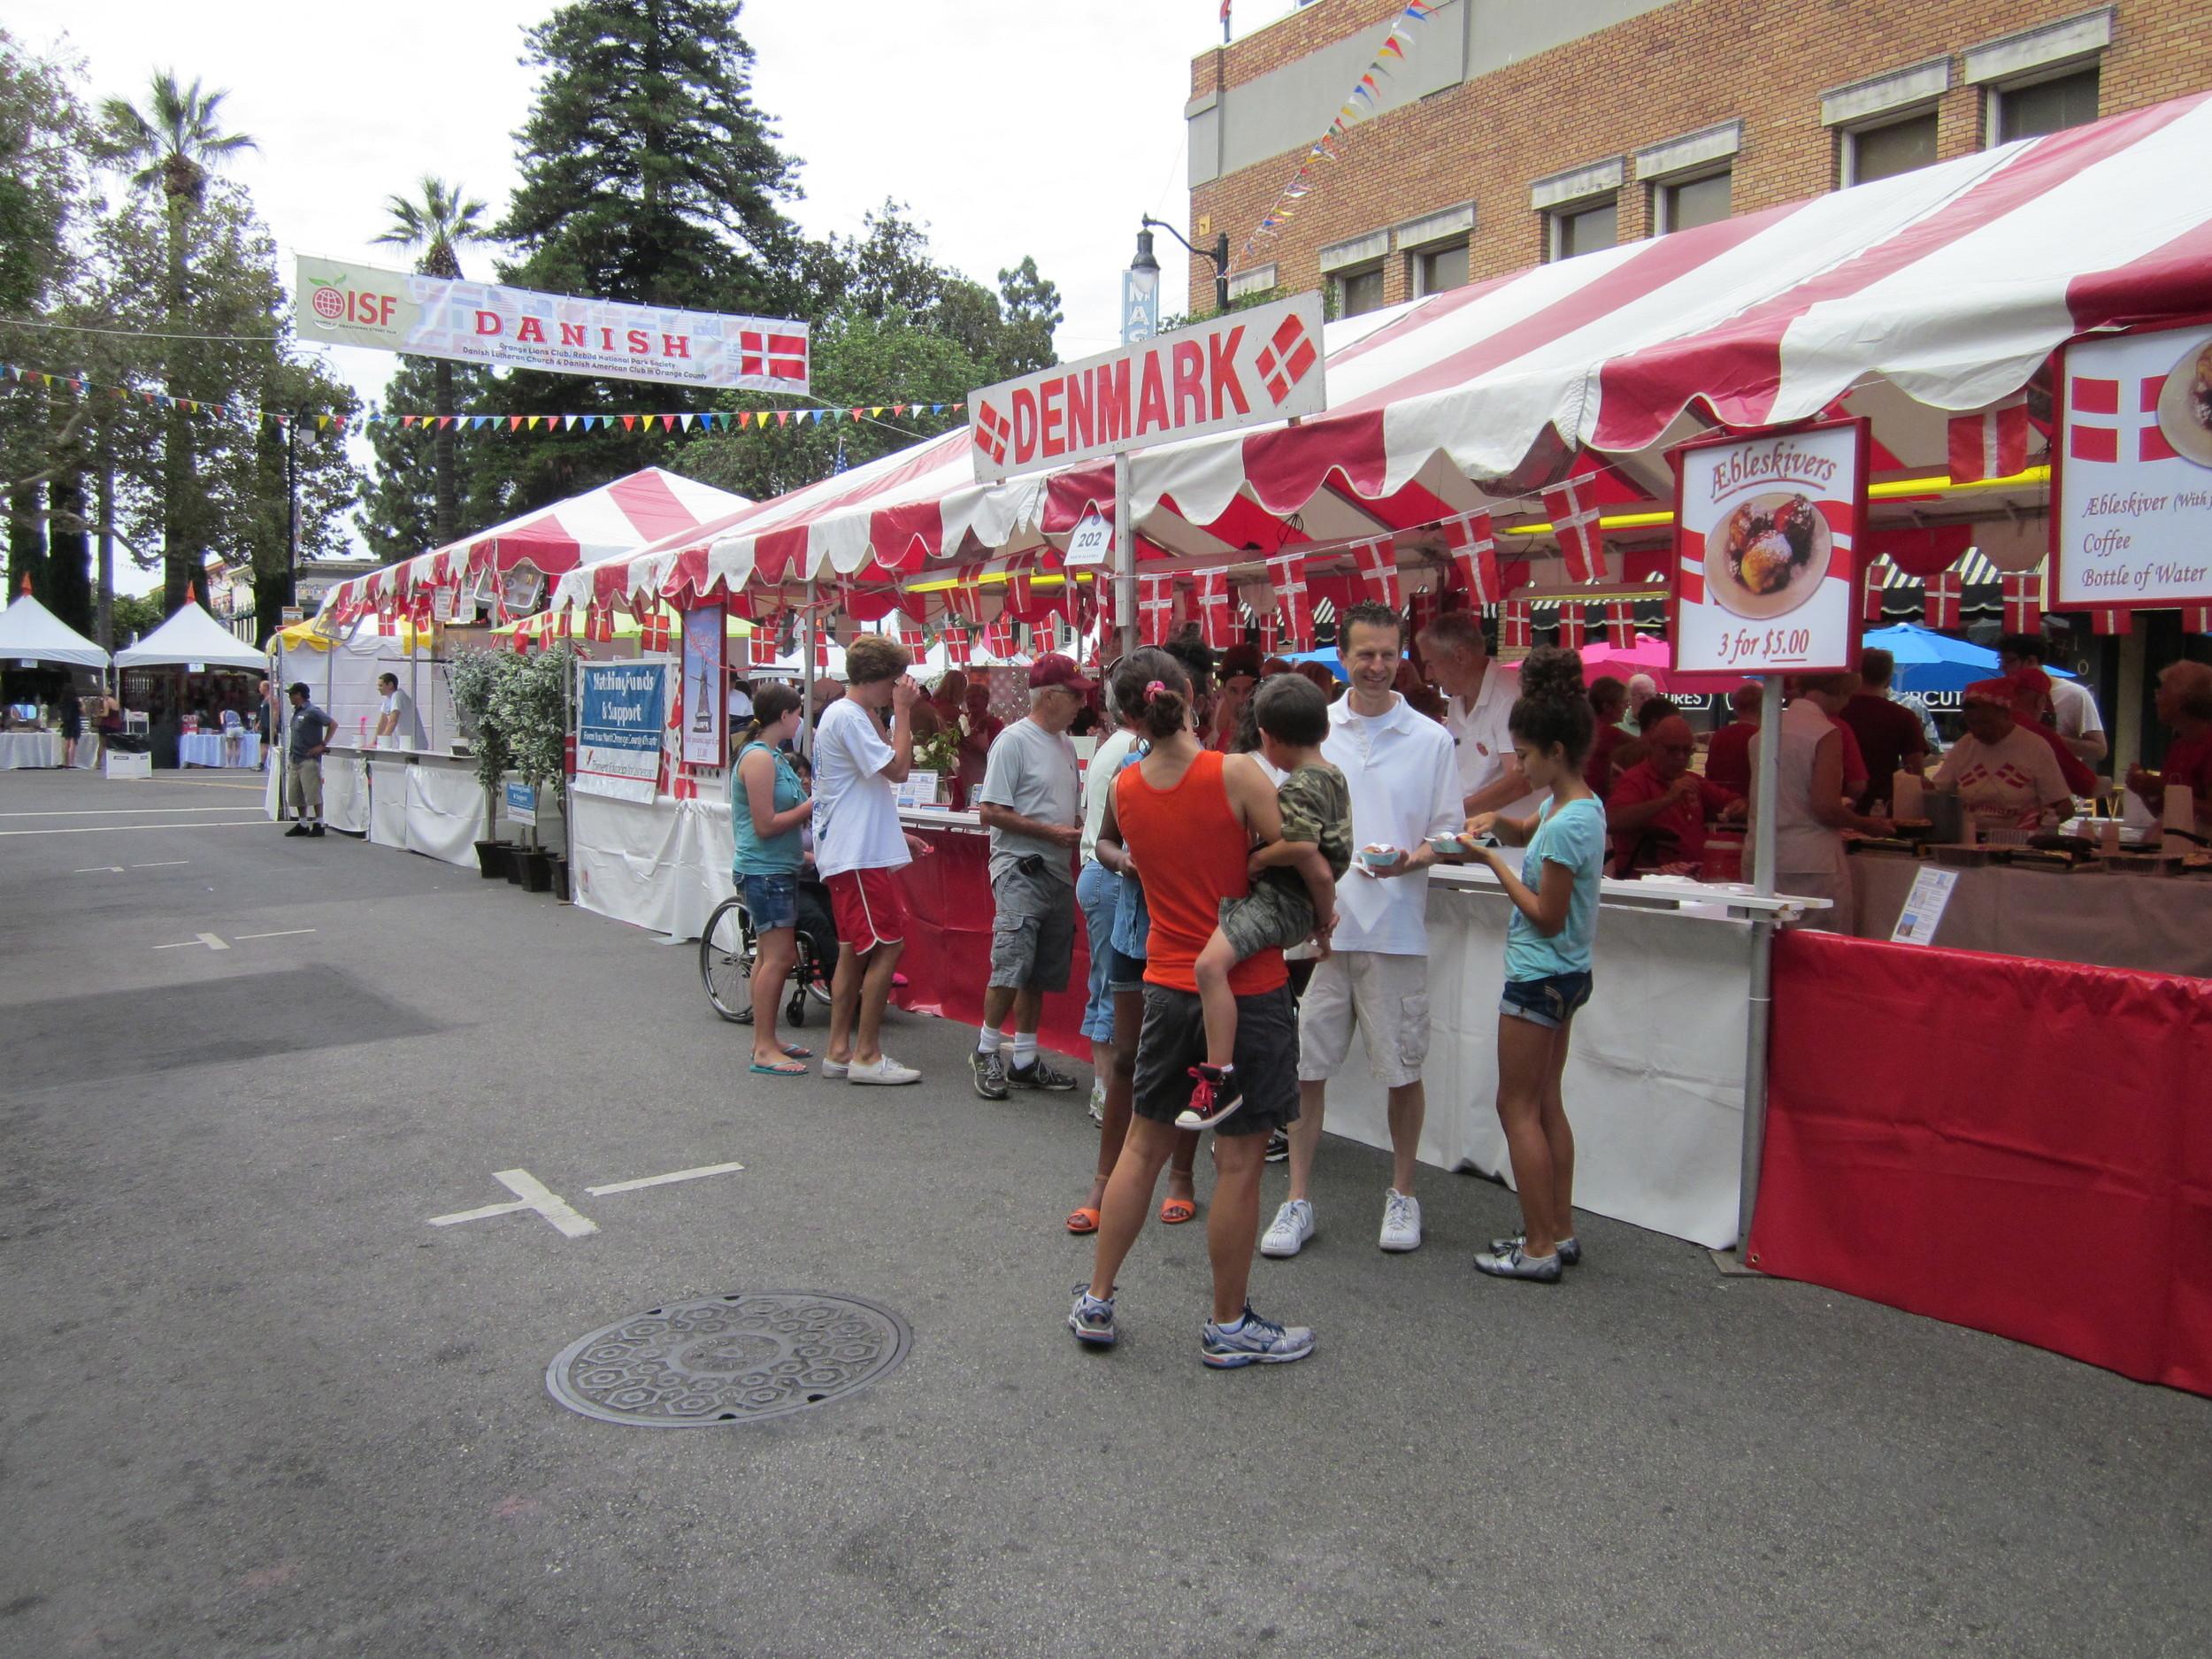 2013.08.30_street_fair_003.JPG